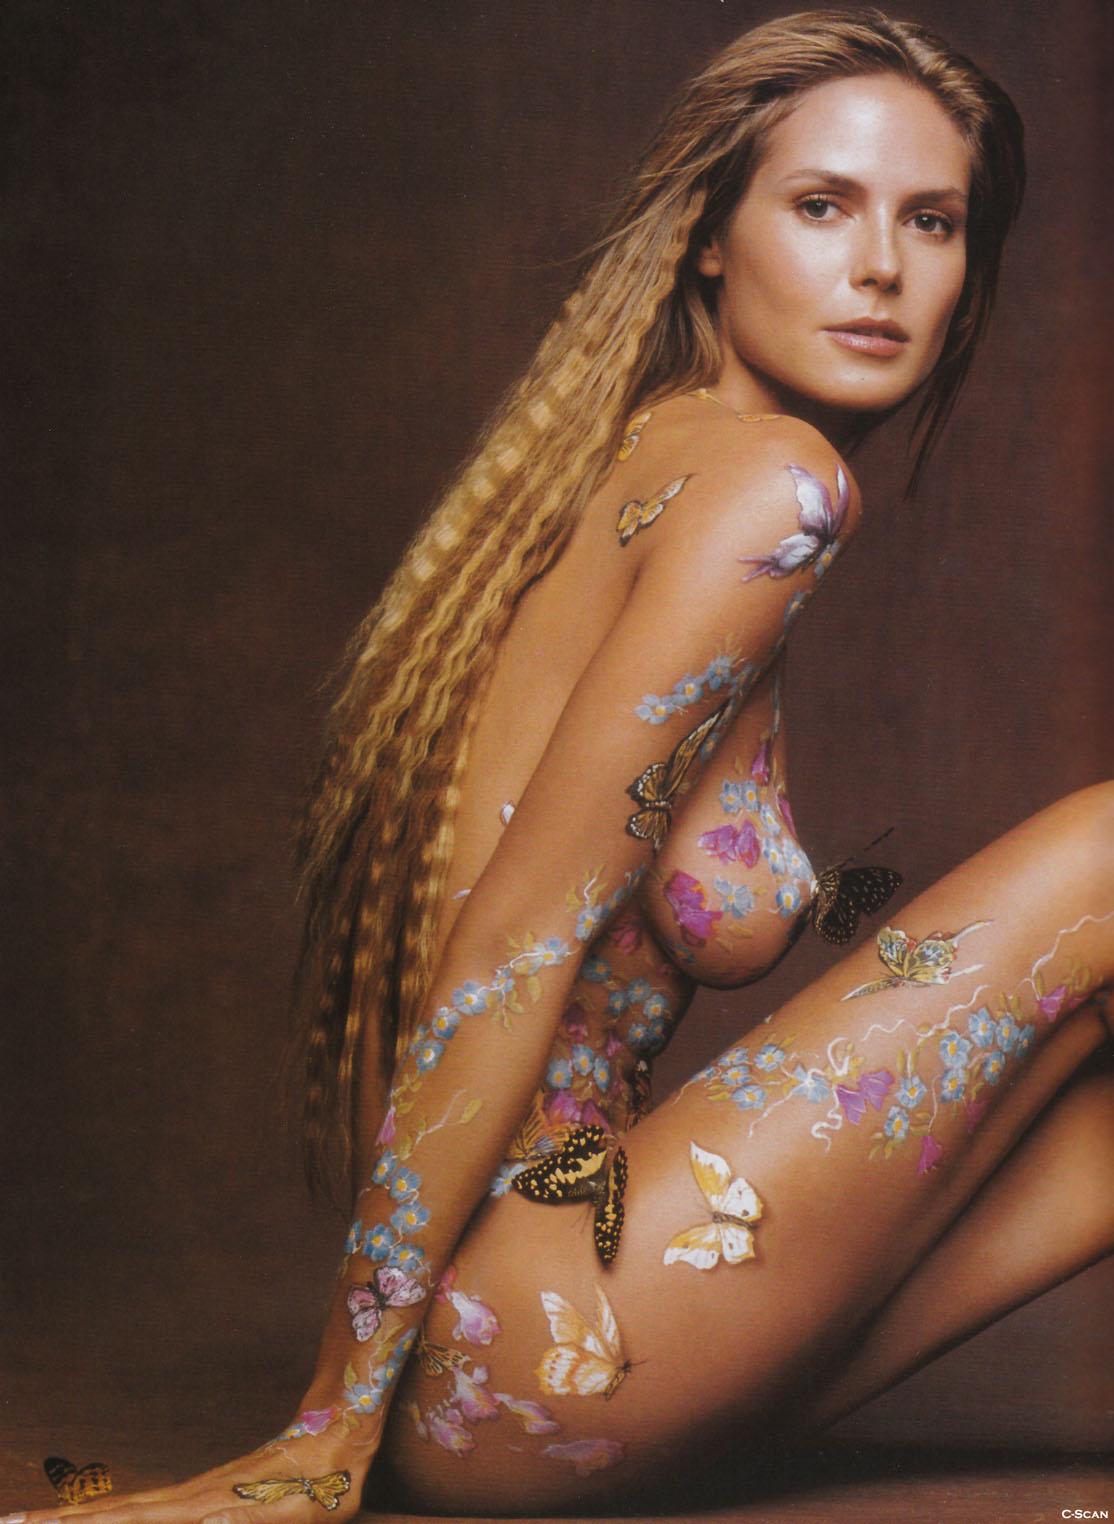 Heidi Klum – Ultimate body paint collection | jasonbeale